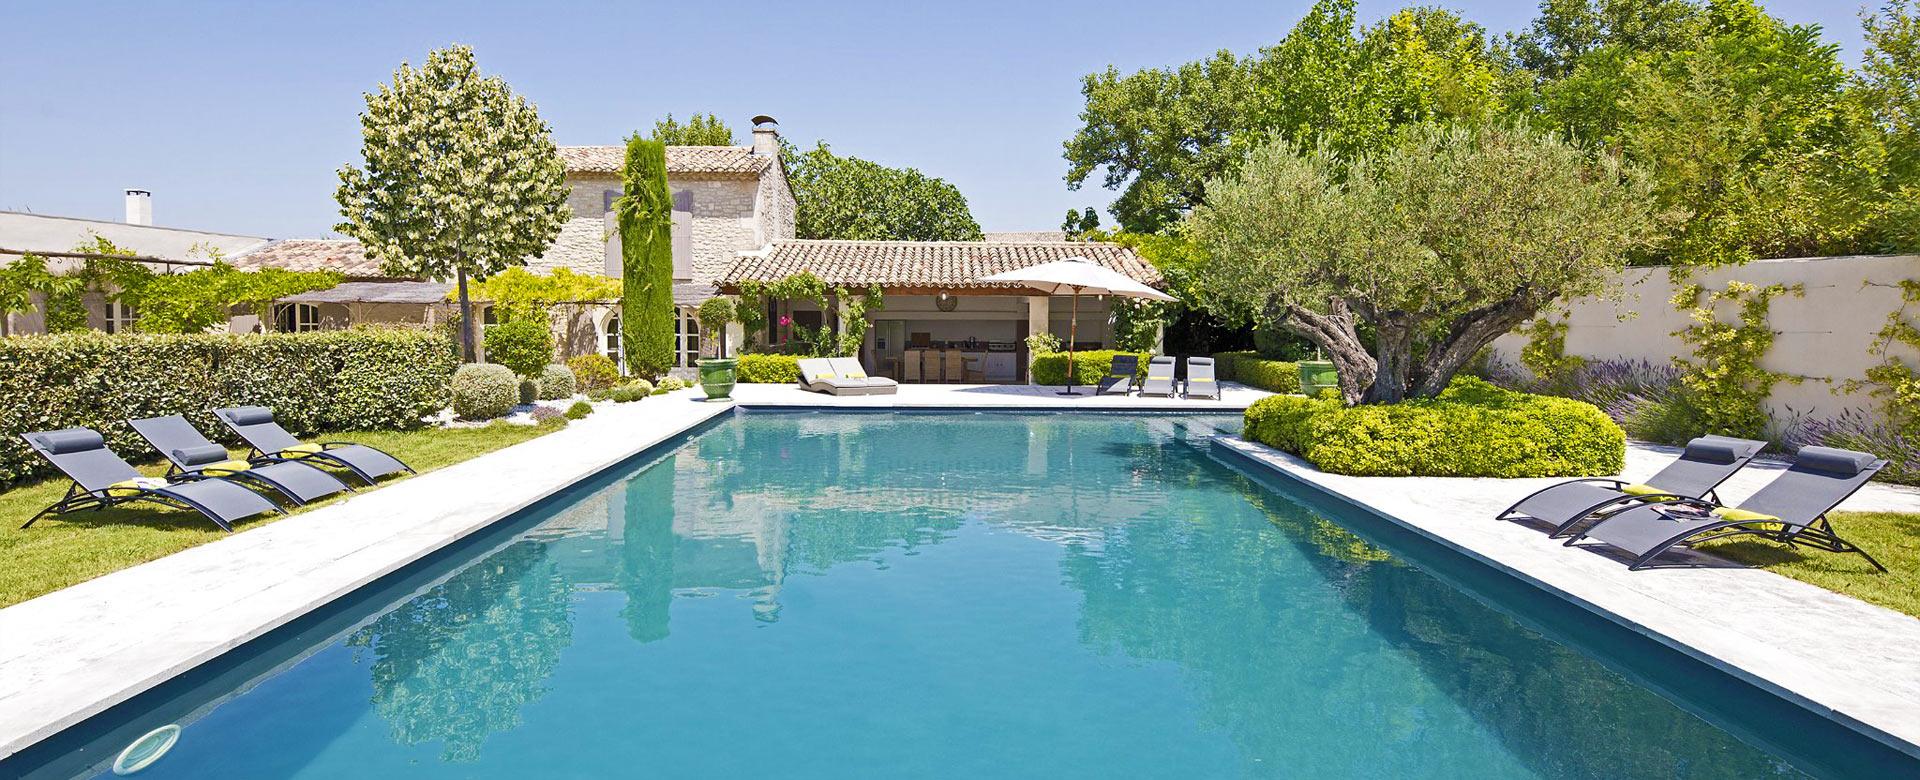 Location de villa de luxe en provence for Location maison de vacances de luxe